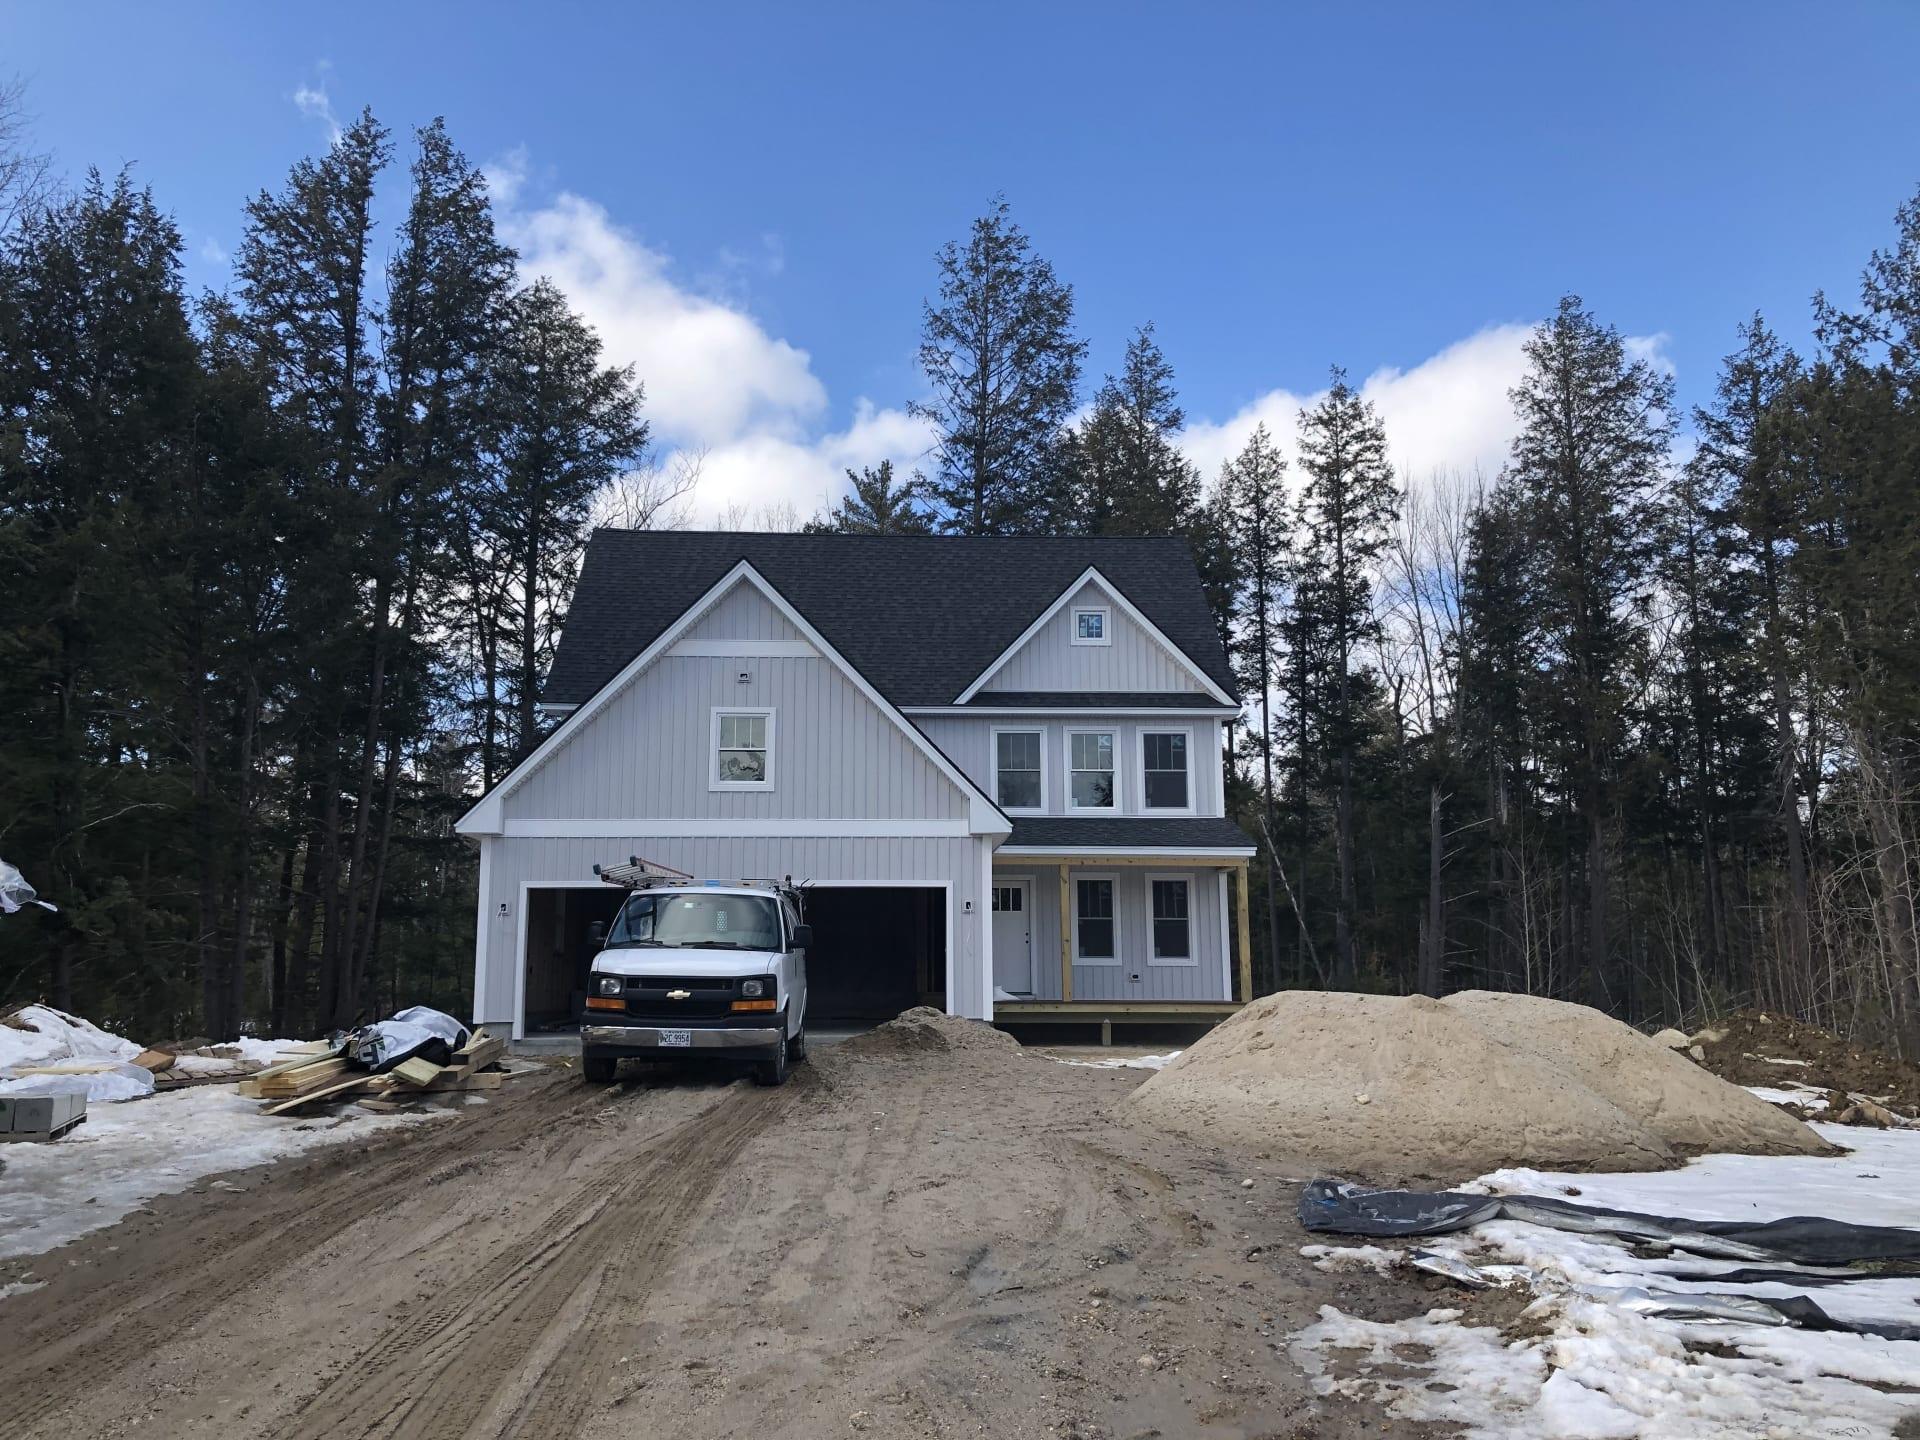 New Home by Pinnacle Home Builders!